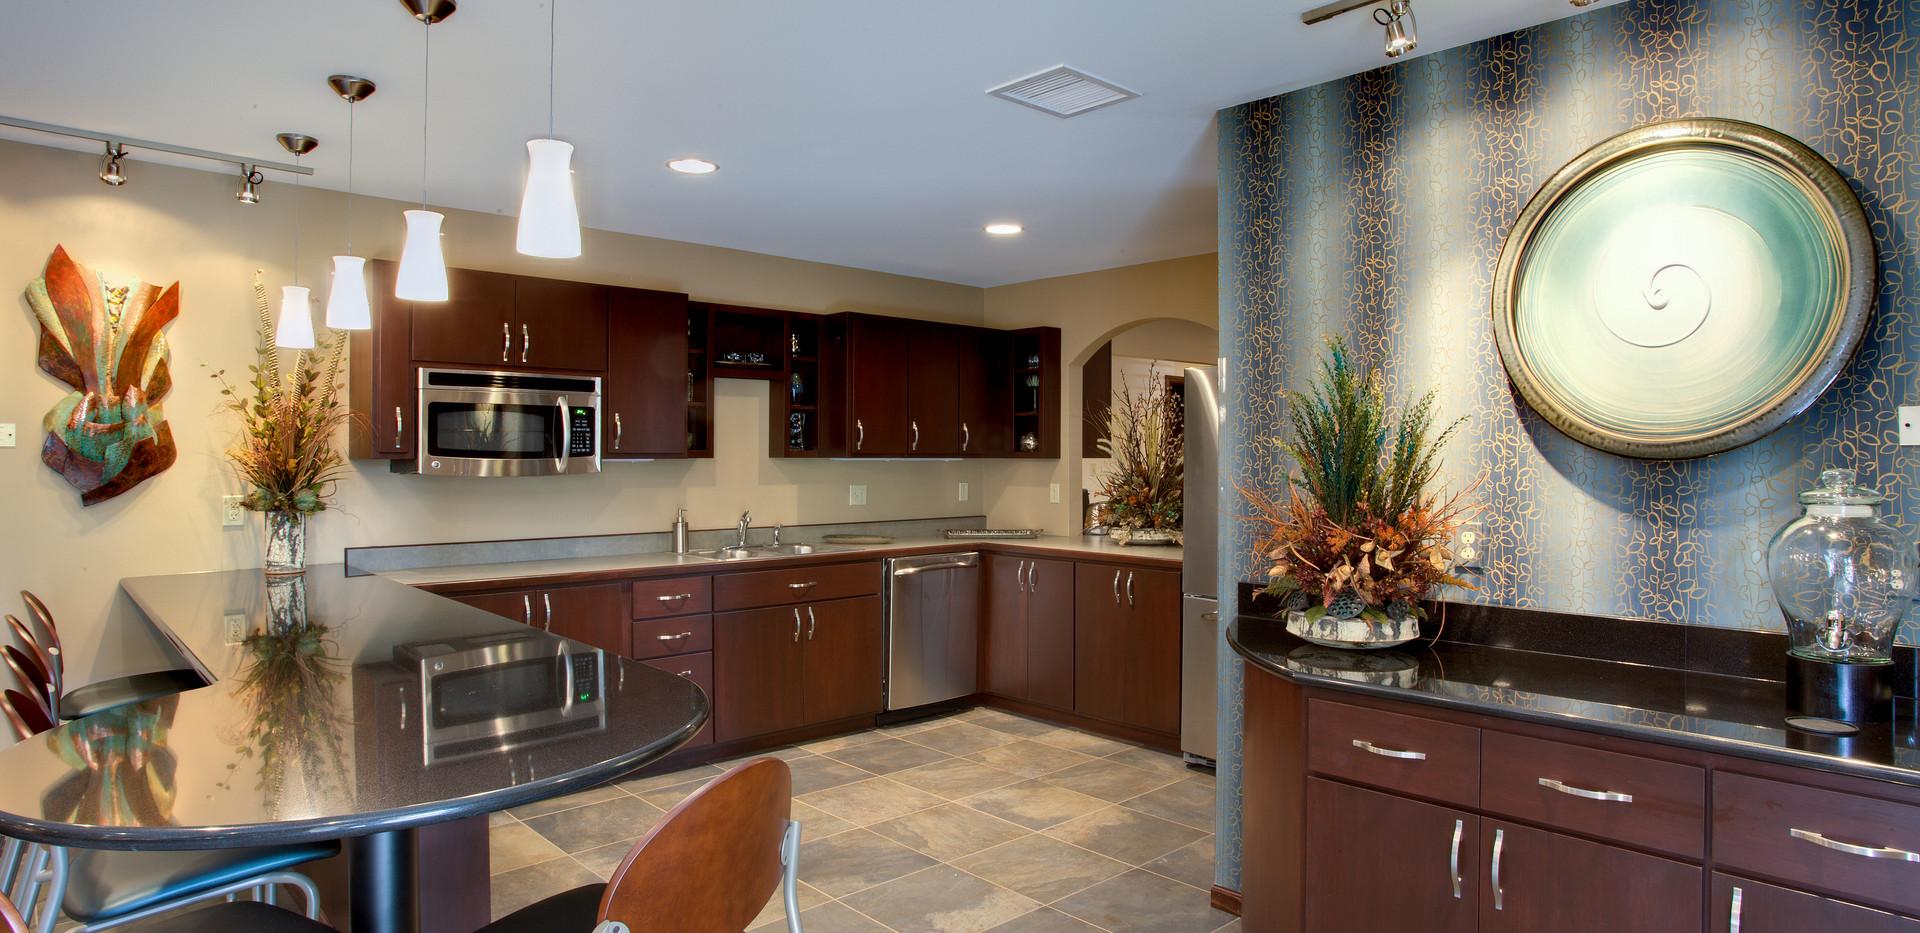 Ollis Interior kitchen.jpg